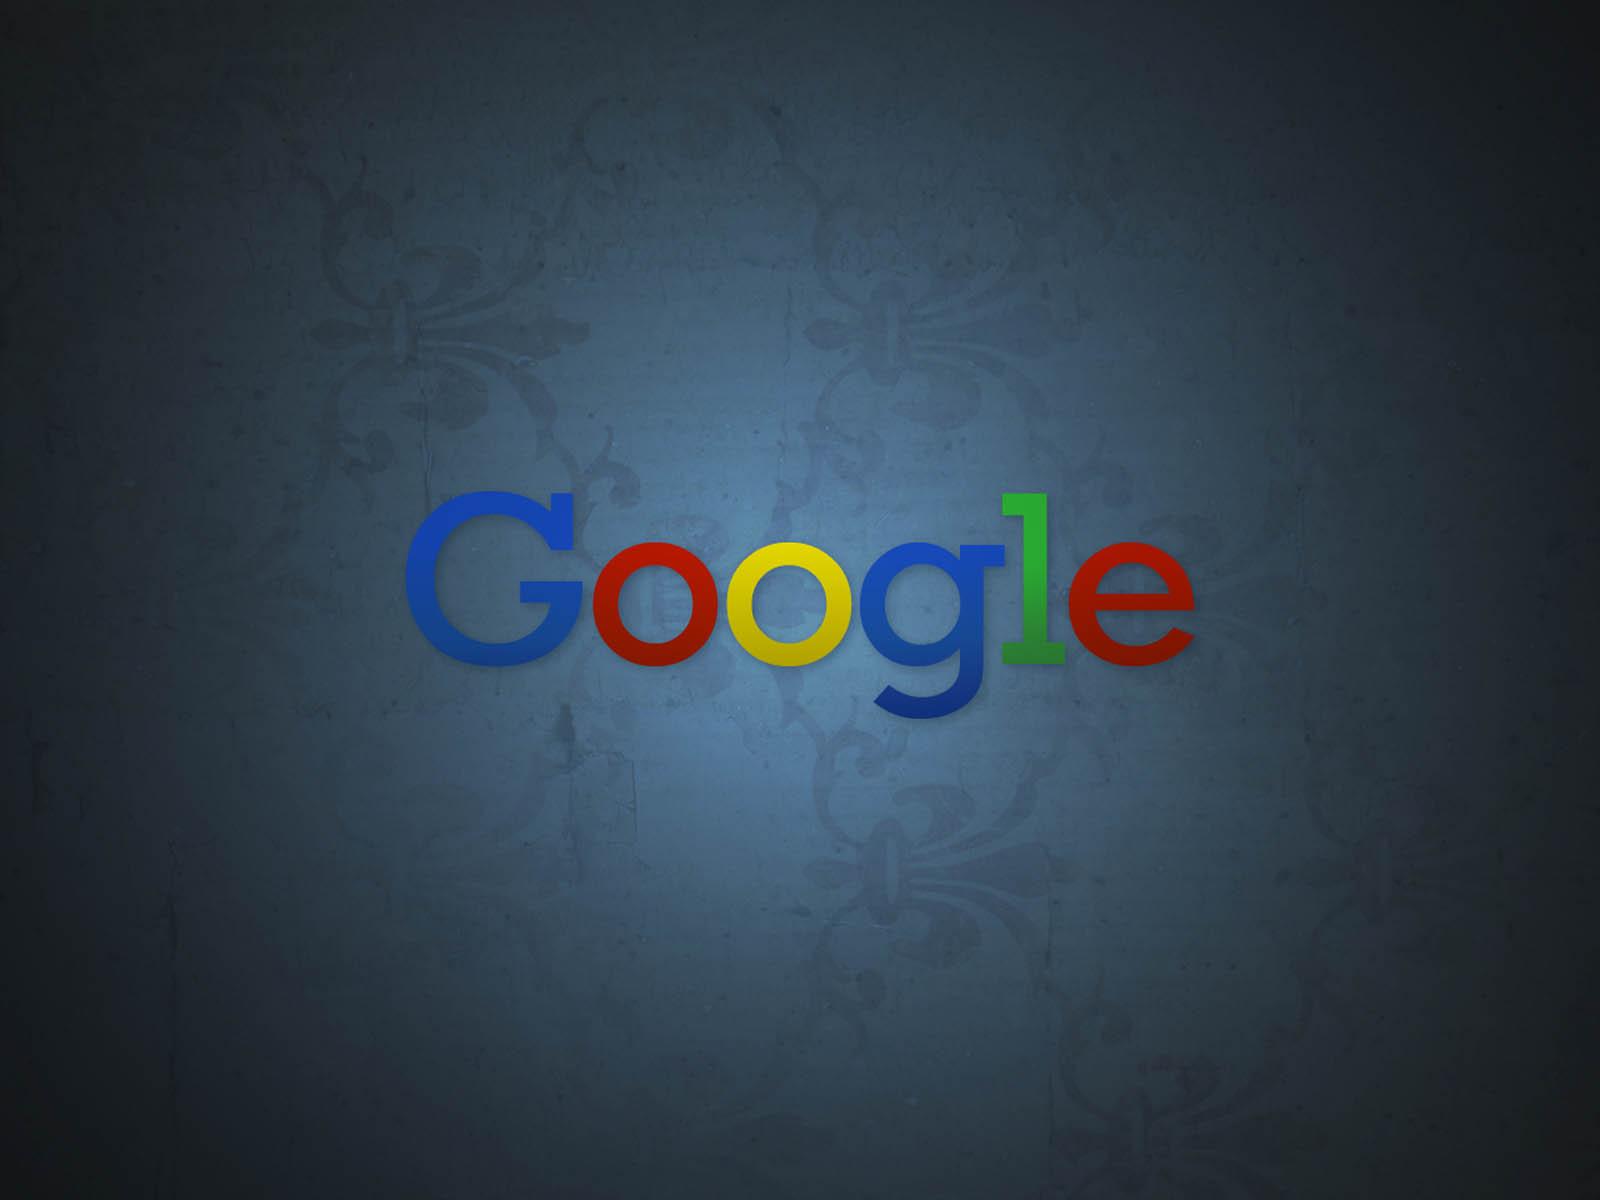 http://1.bp.blogspot.com/-k0_zP9dhjnk/UAumBp_PtgI/AAAAAAAAGBc/C57Fgoeadq4/s1600/Google%2BWallpapers%2BAnd%2BBackgrounds%2B1.jpg